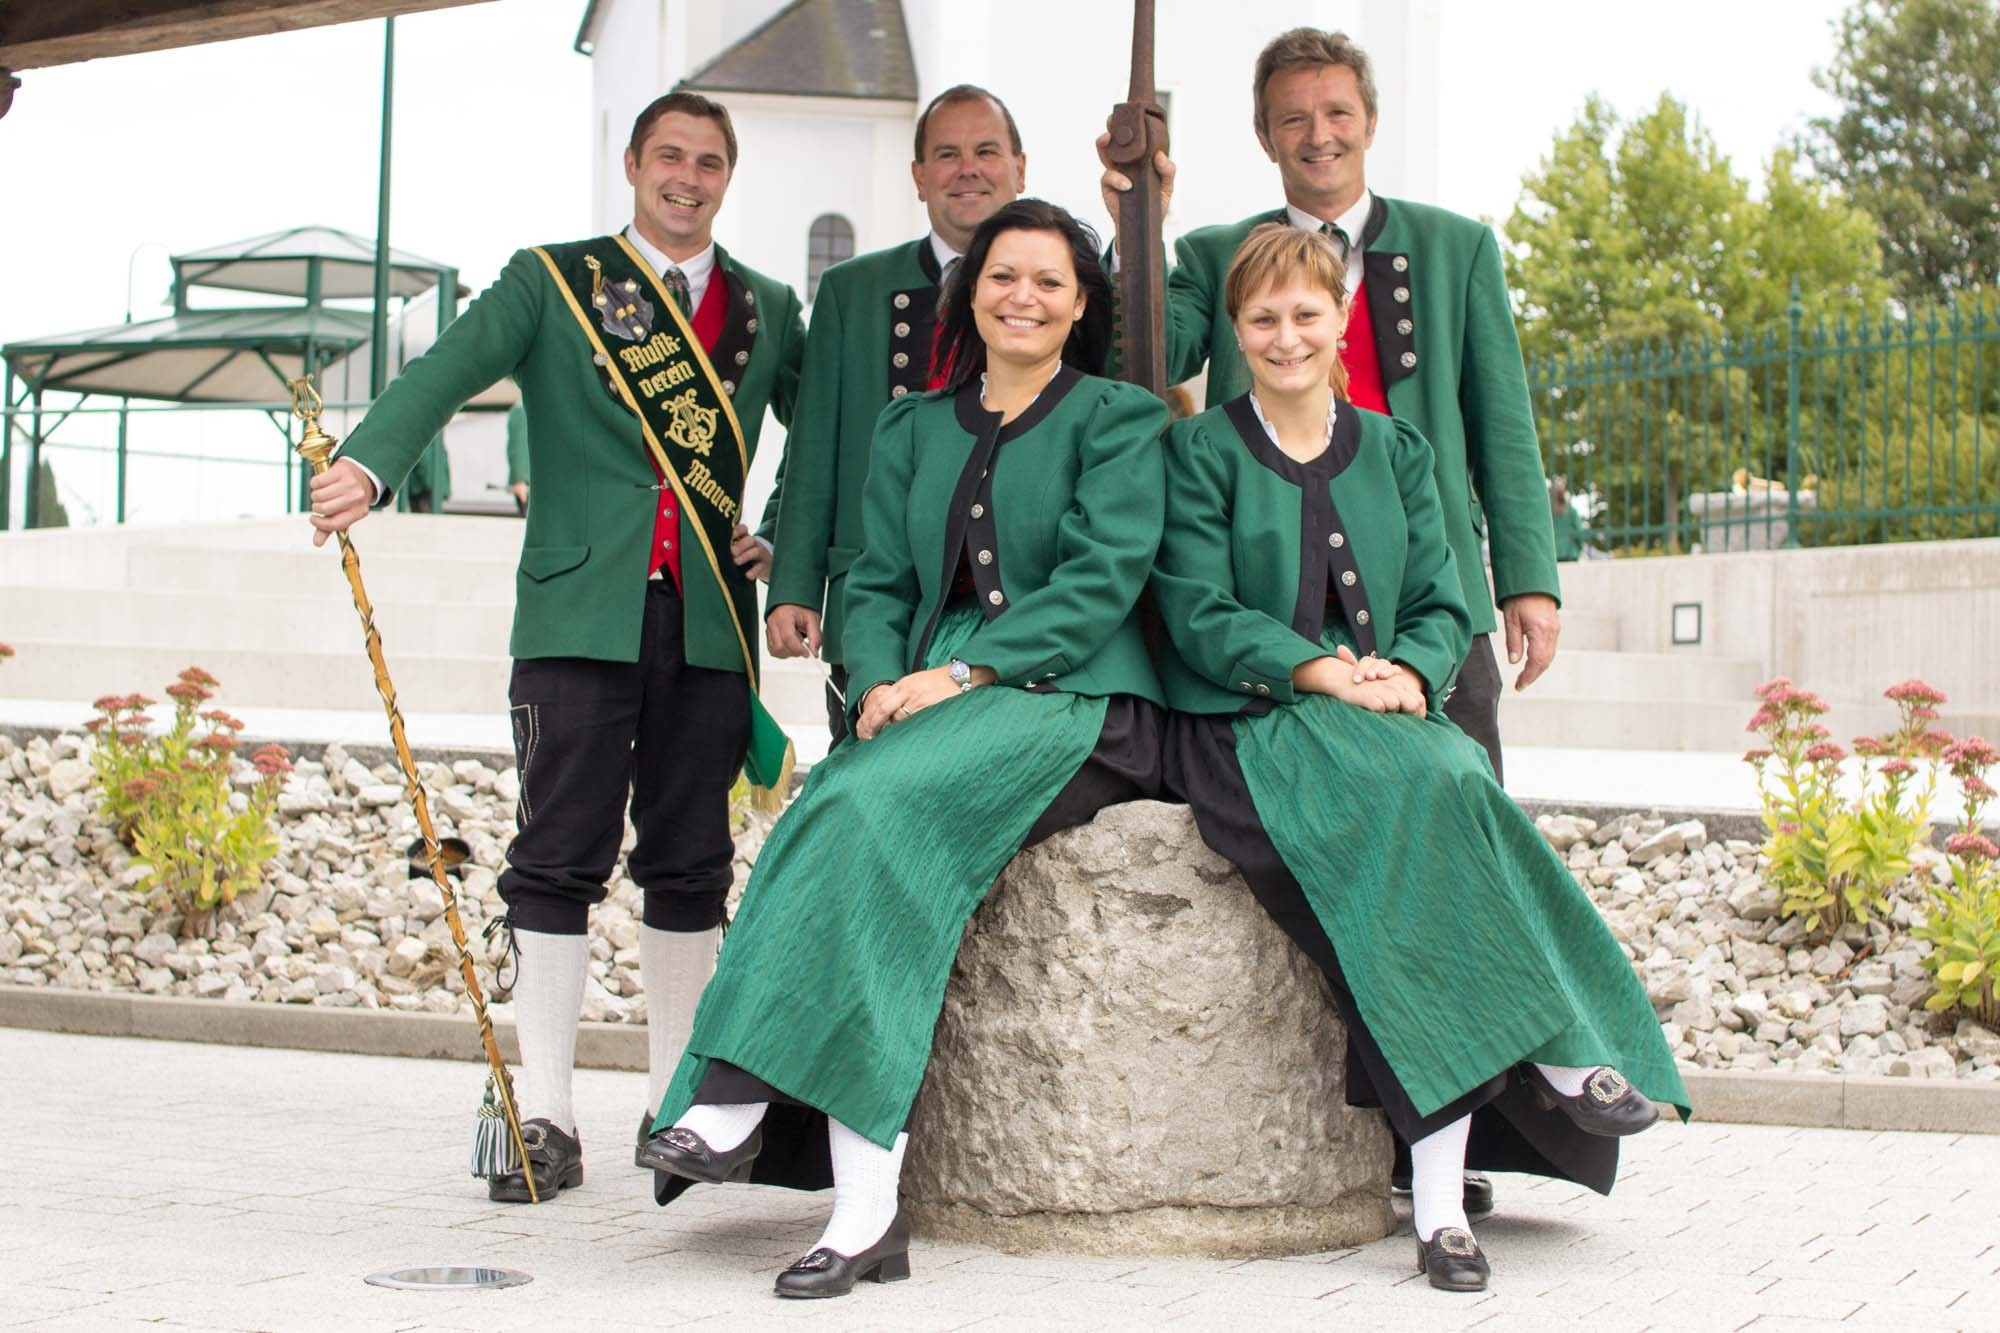 v.l.n.r.: Jürgen Scherscher, Johann Eblinger, Nicole Wahlmüller, Katharina Kremser, Alois Pfleger